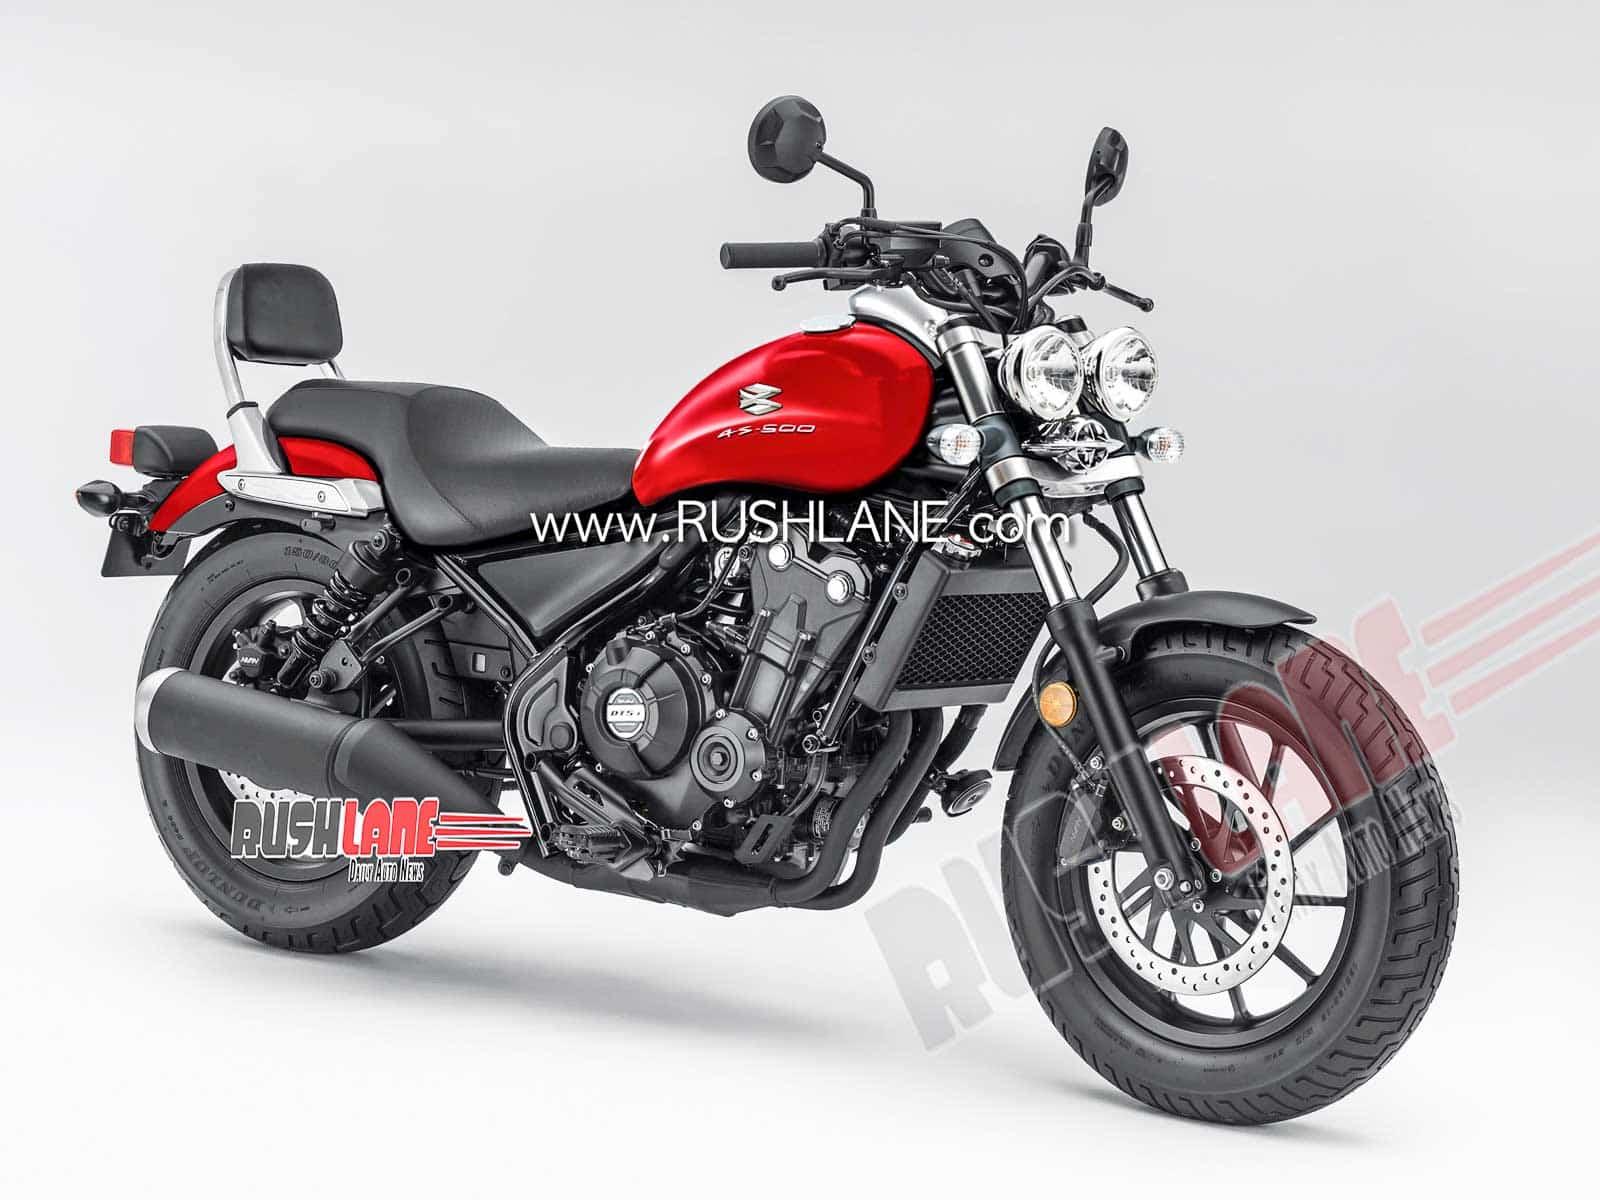 Bajaj Triumph 700 launch